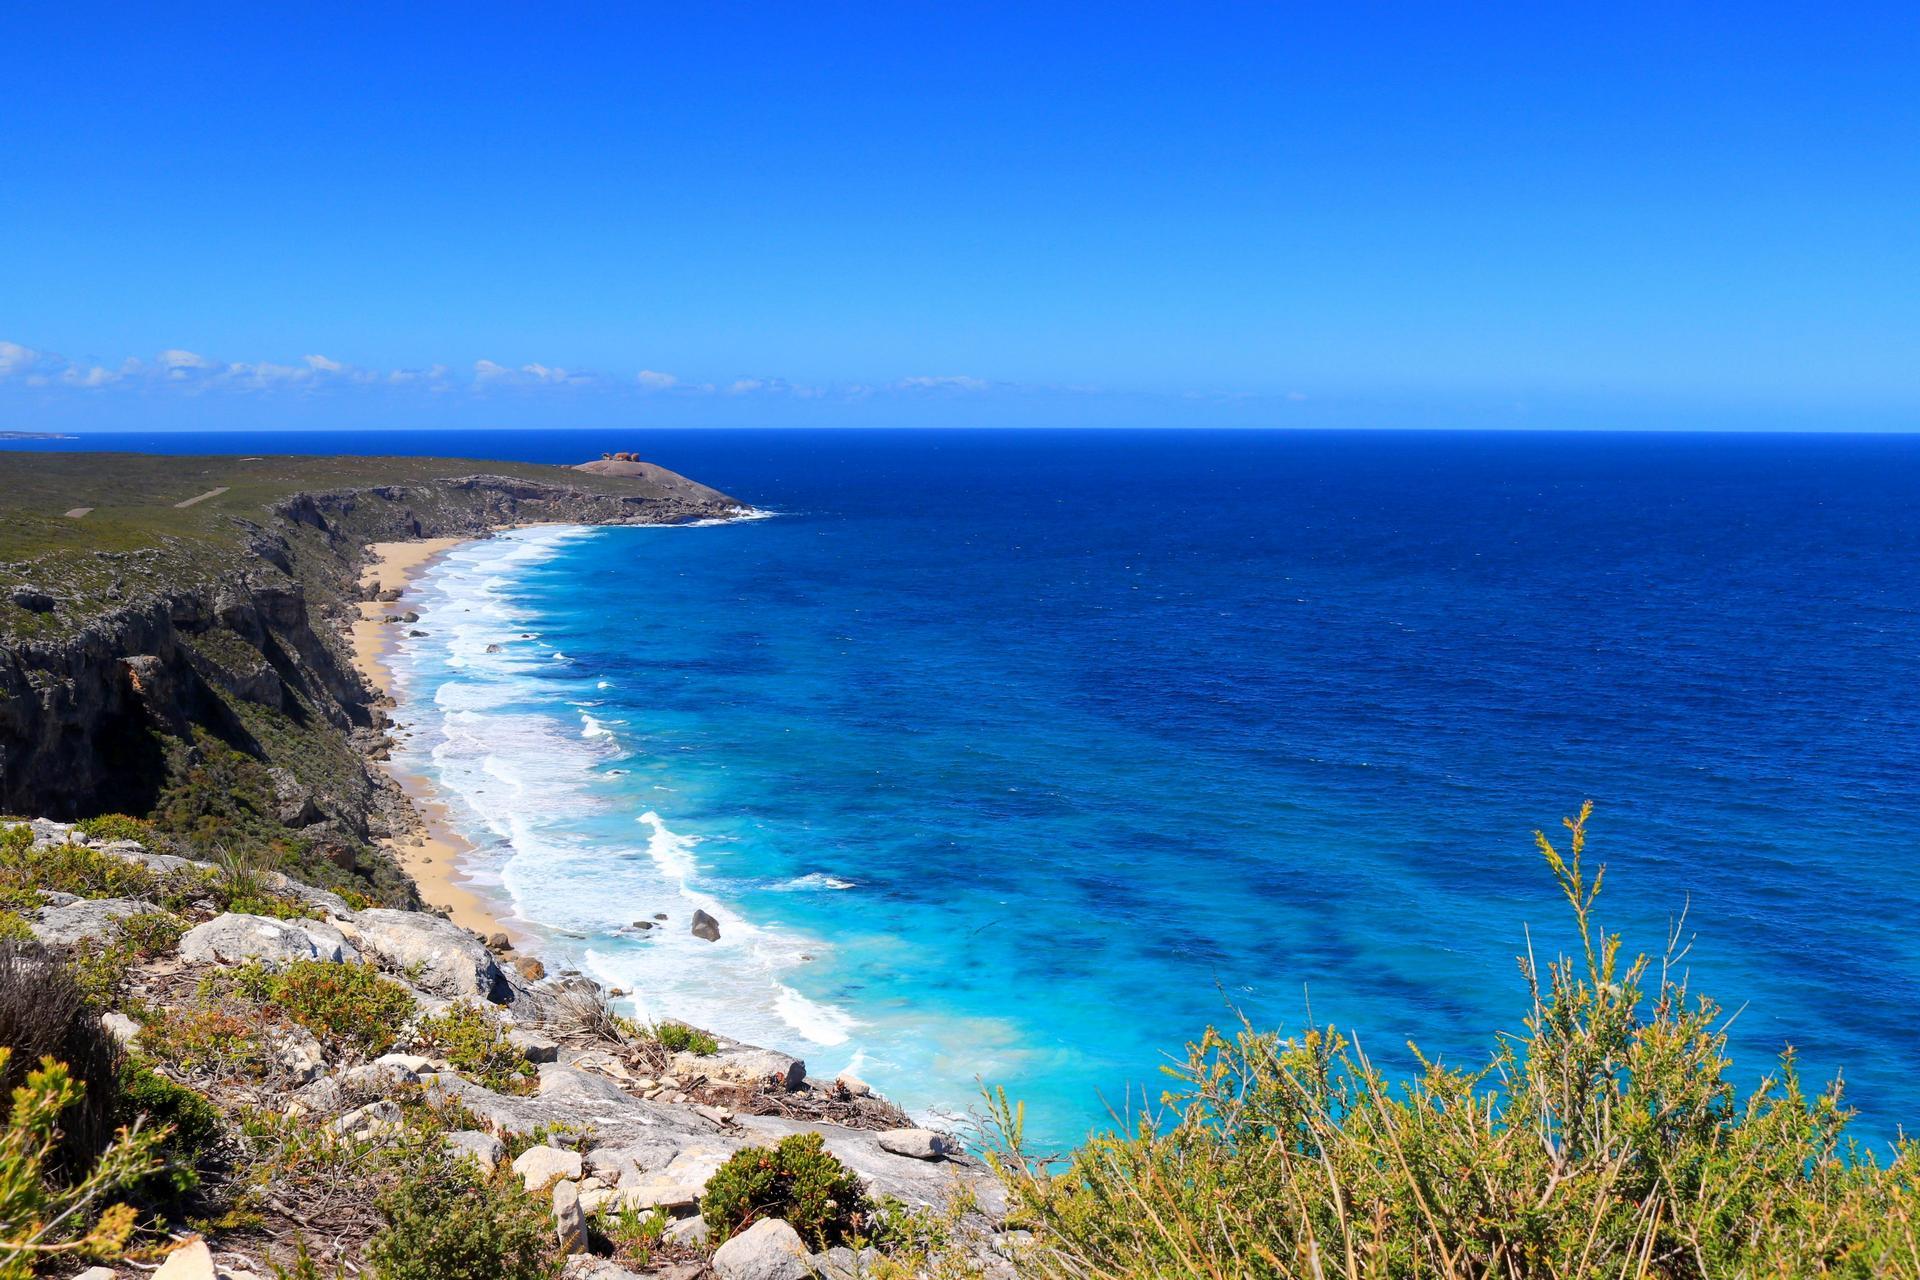 Australia Południowo-Wschodnia, Kangaroo Island